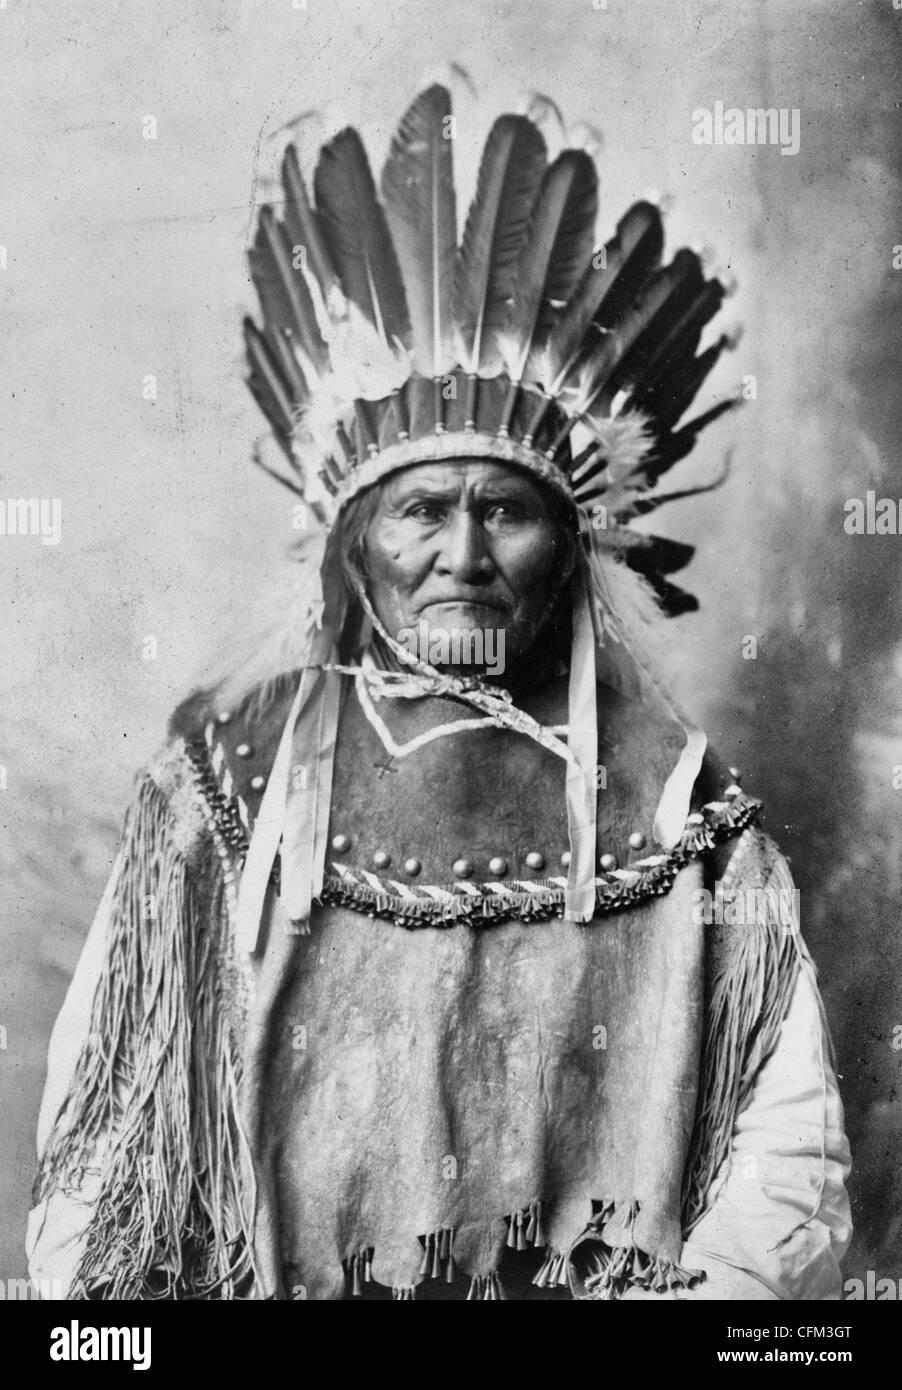 Geronimo - Apache tribal chief, circa 1907 - Stock Image